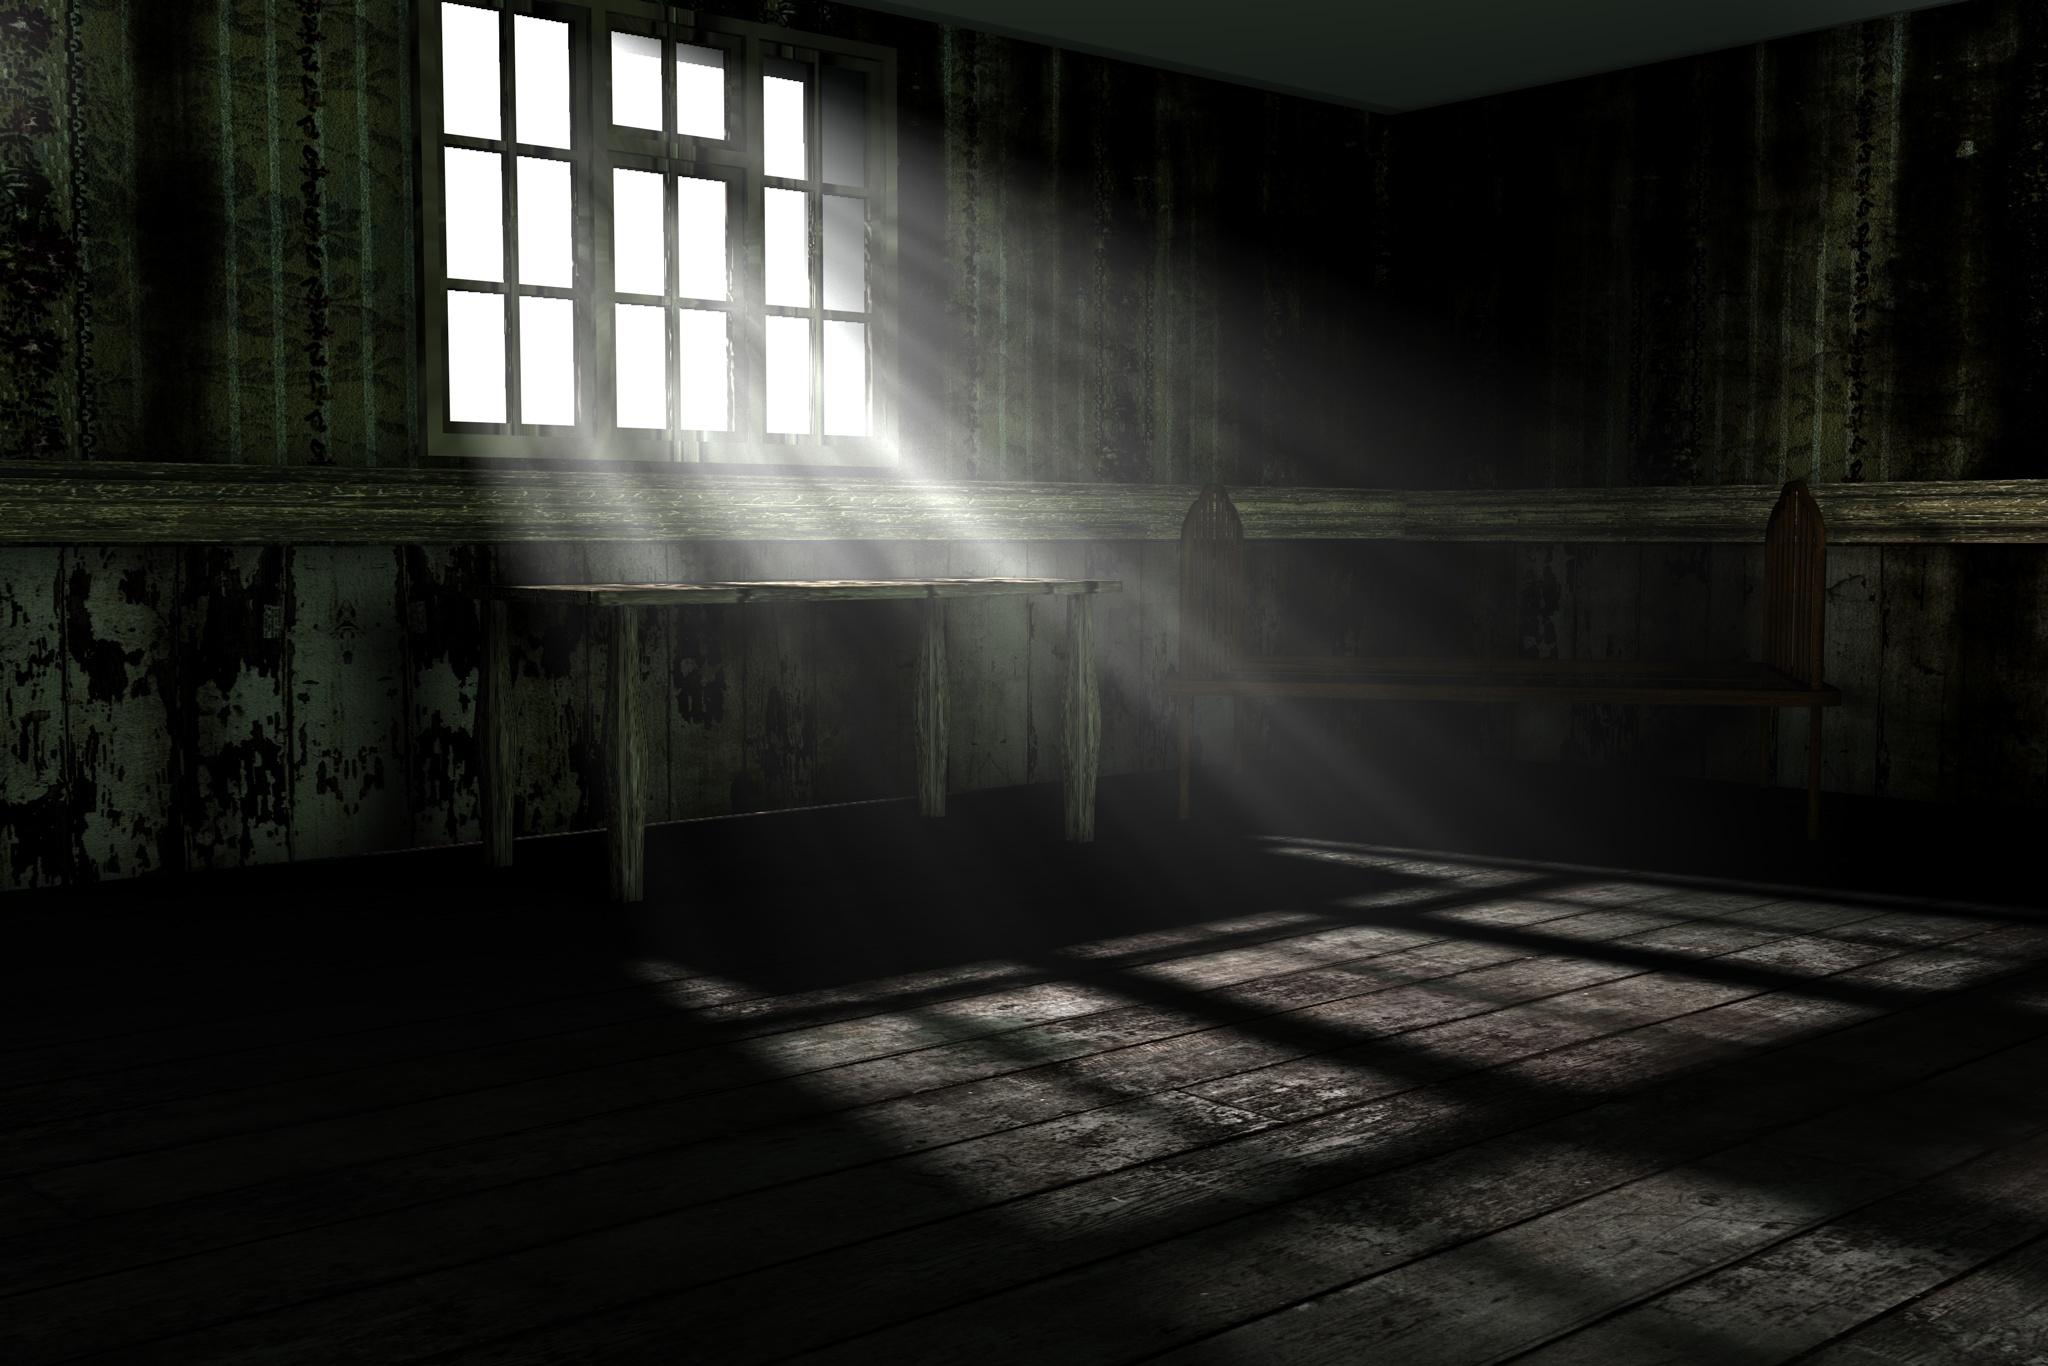 Dark Room Work In Progress By Damenfaltor On Deviantart